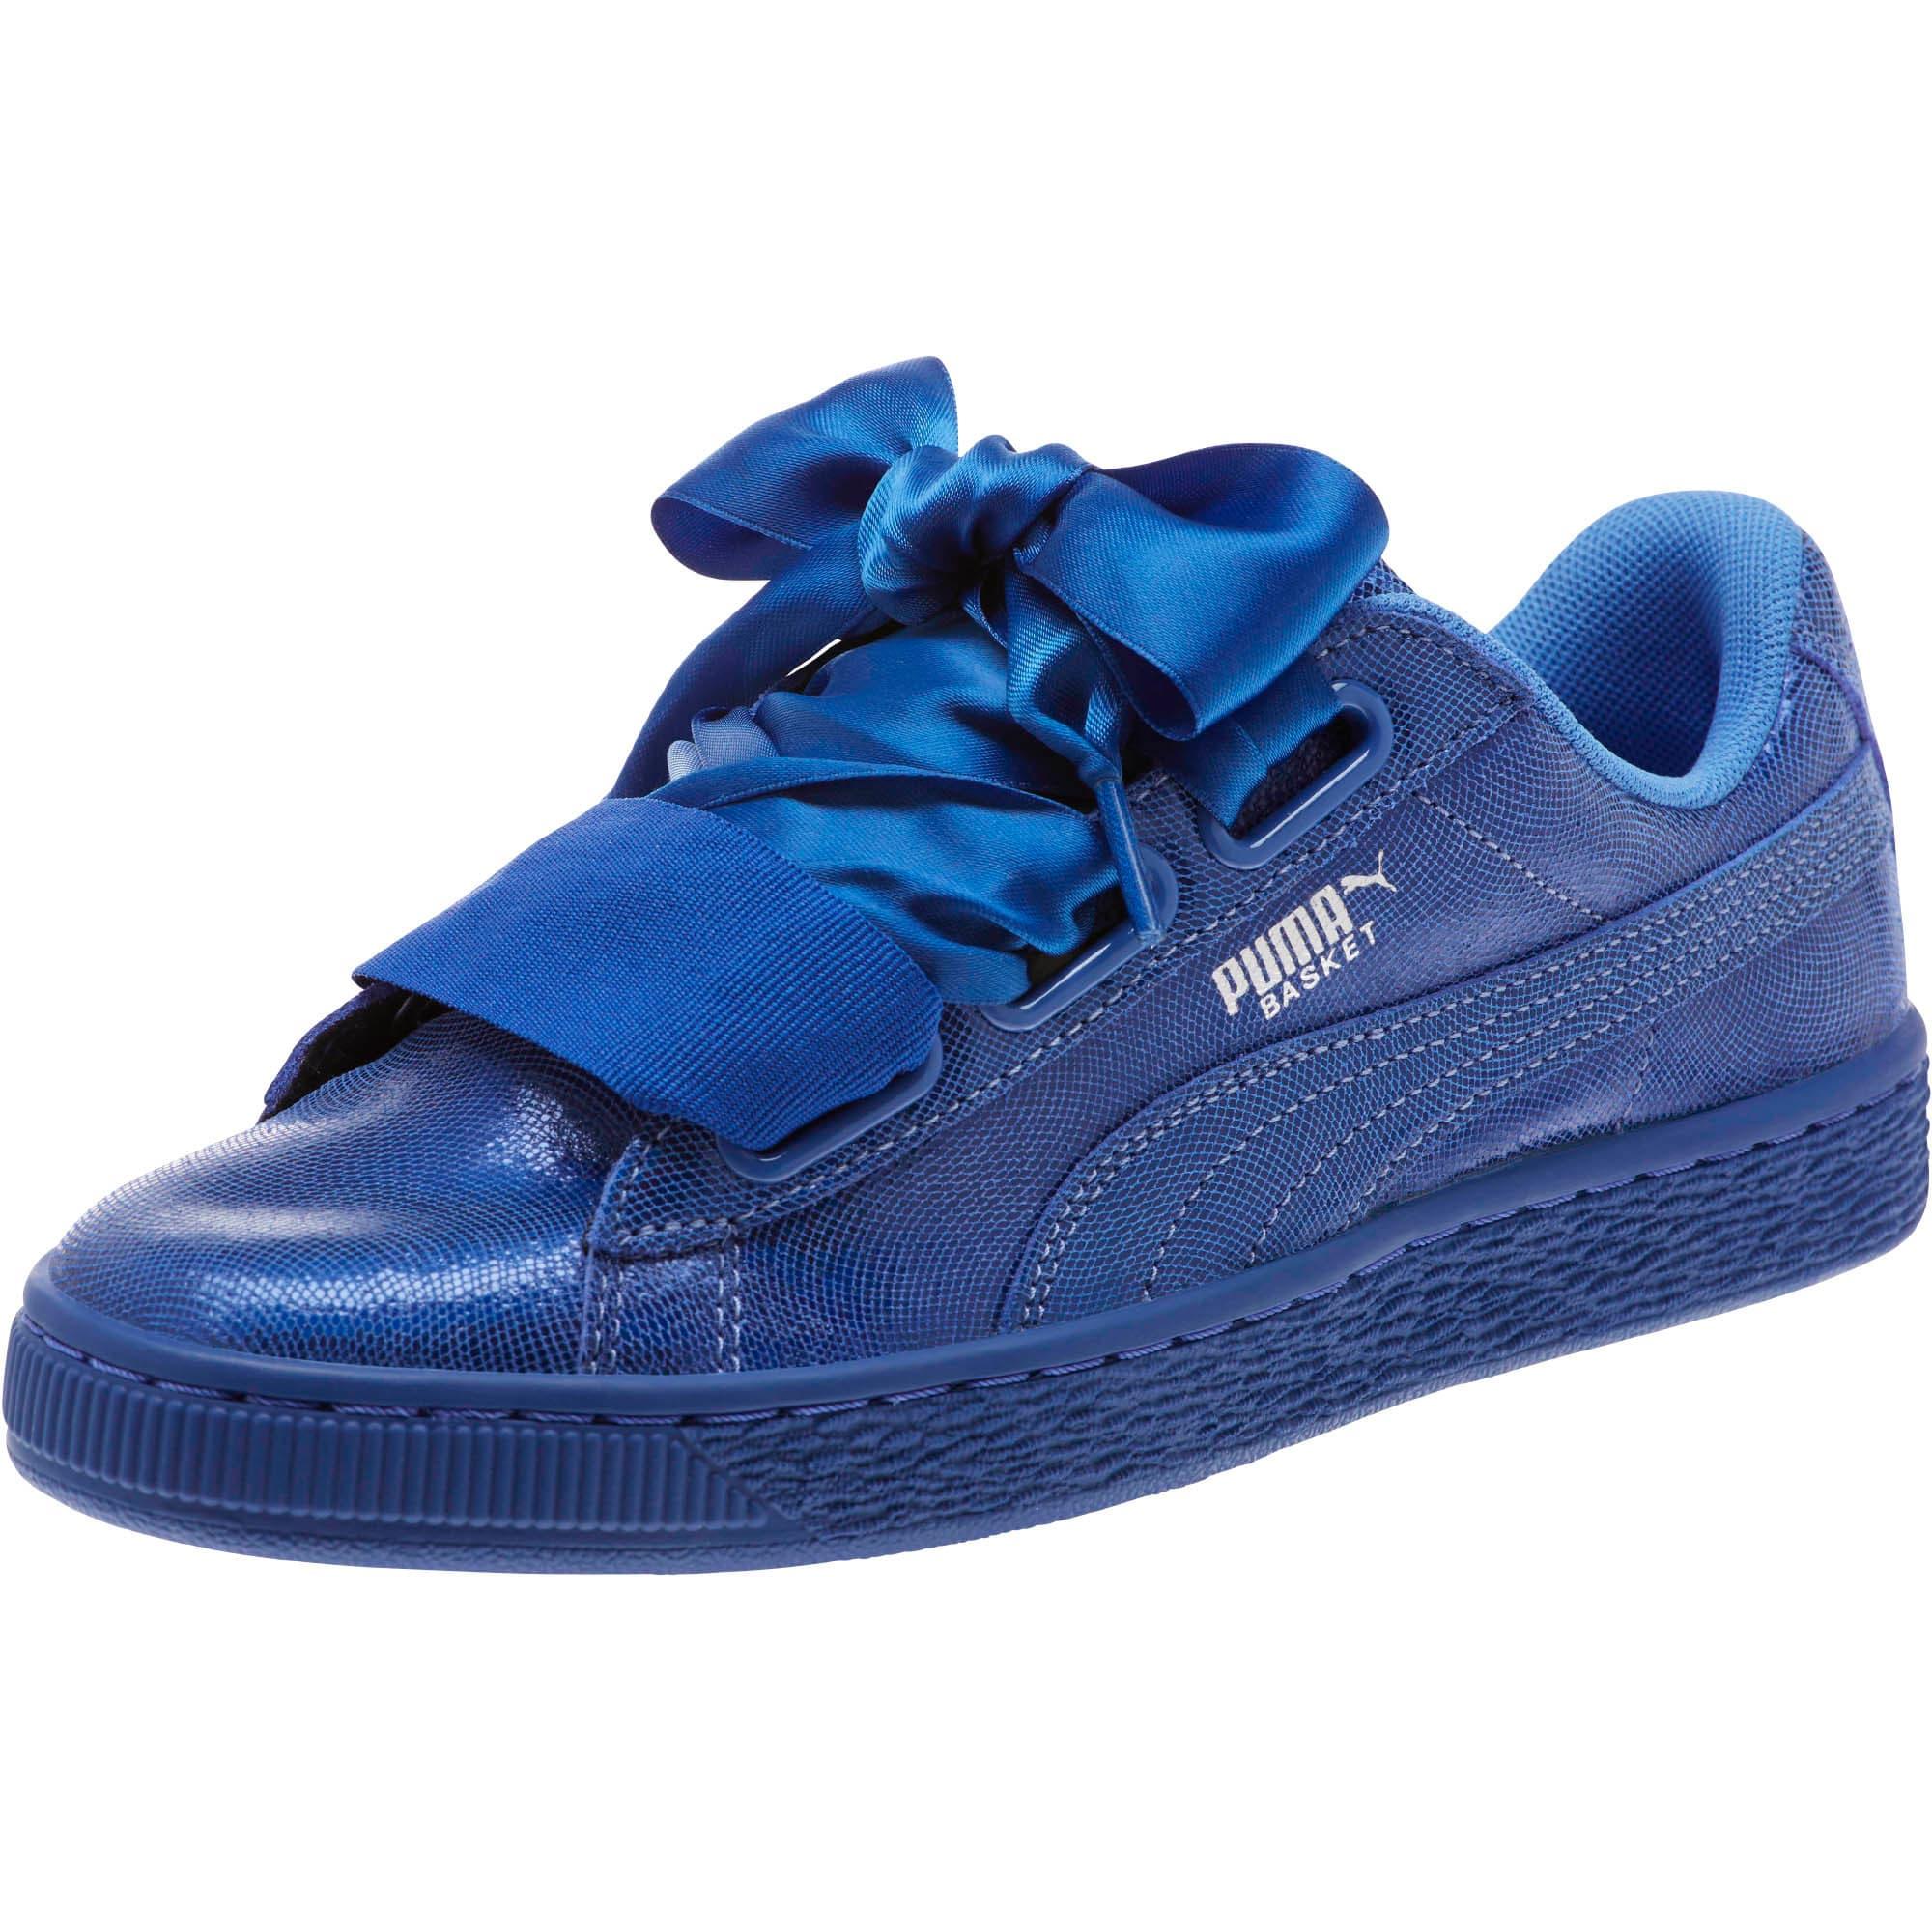 Thumbnail 1 of Basket Heart Opulence Women's Sneakers, Baja Blue-Baja Blue, medium